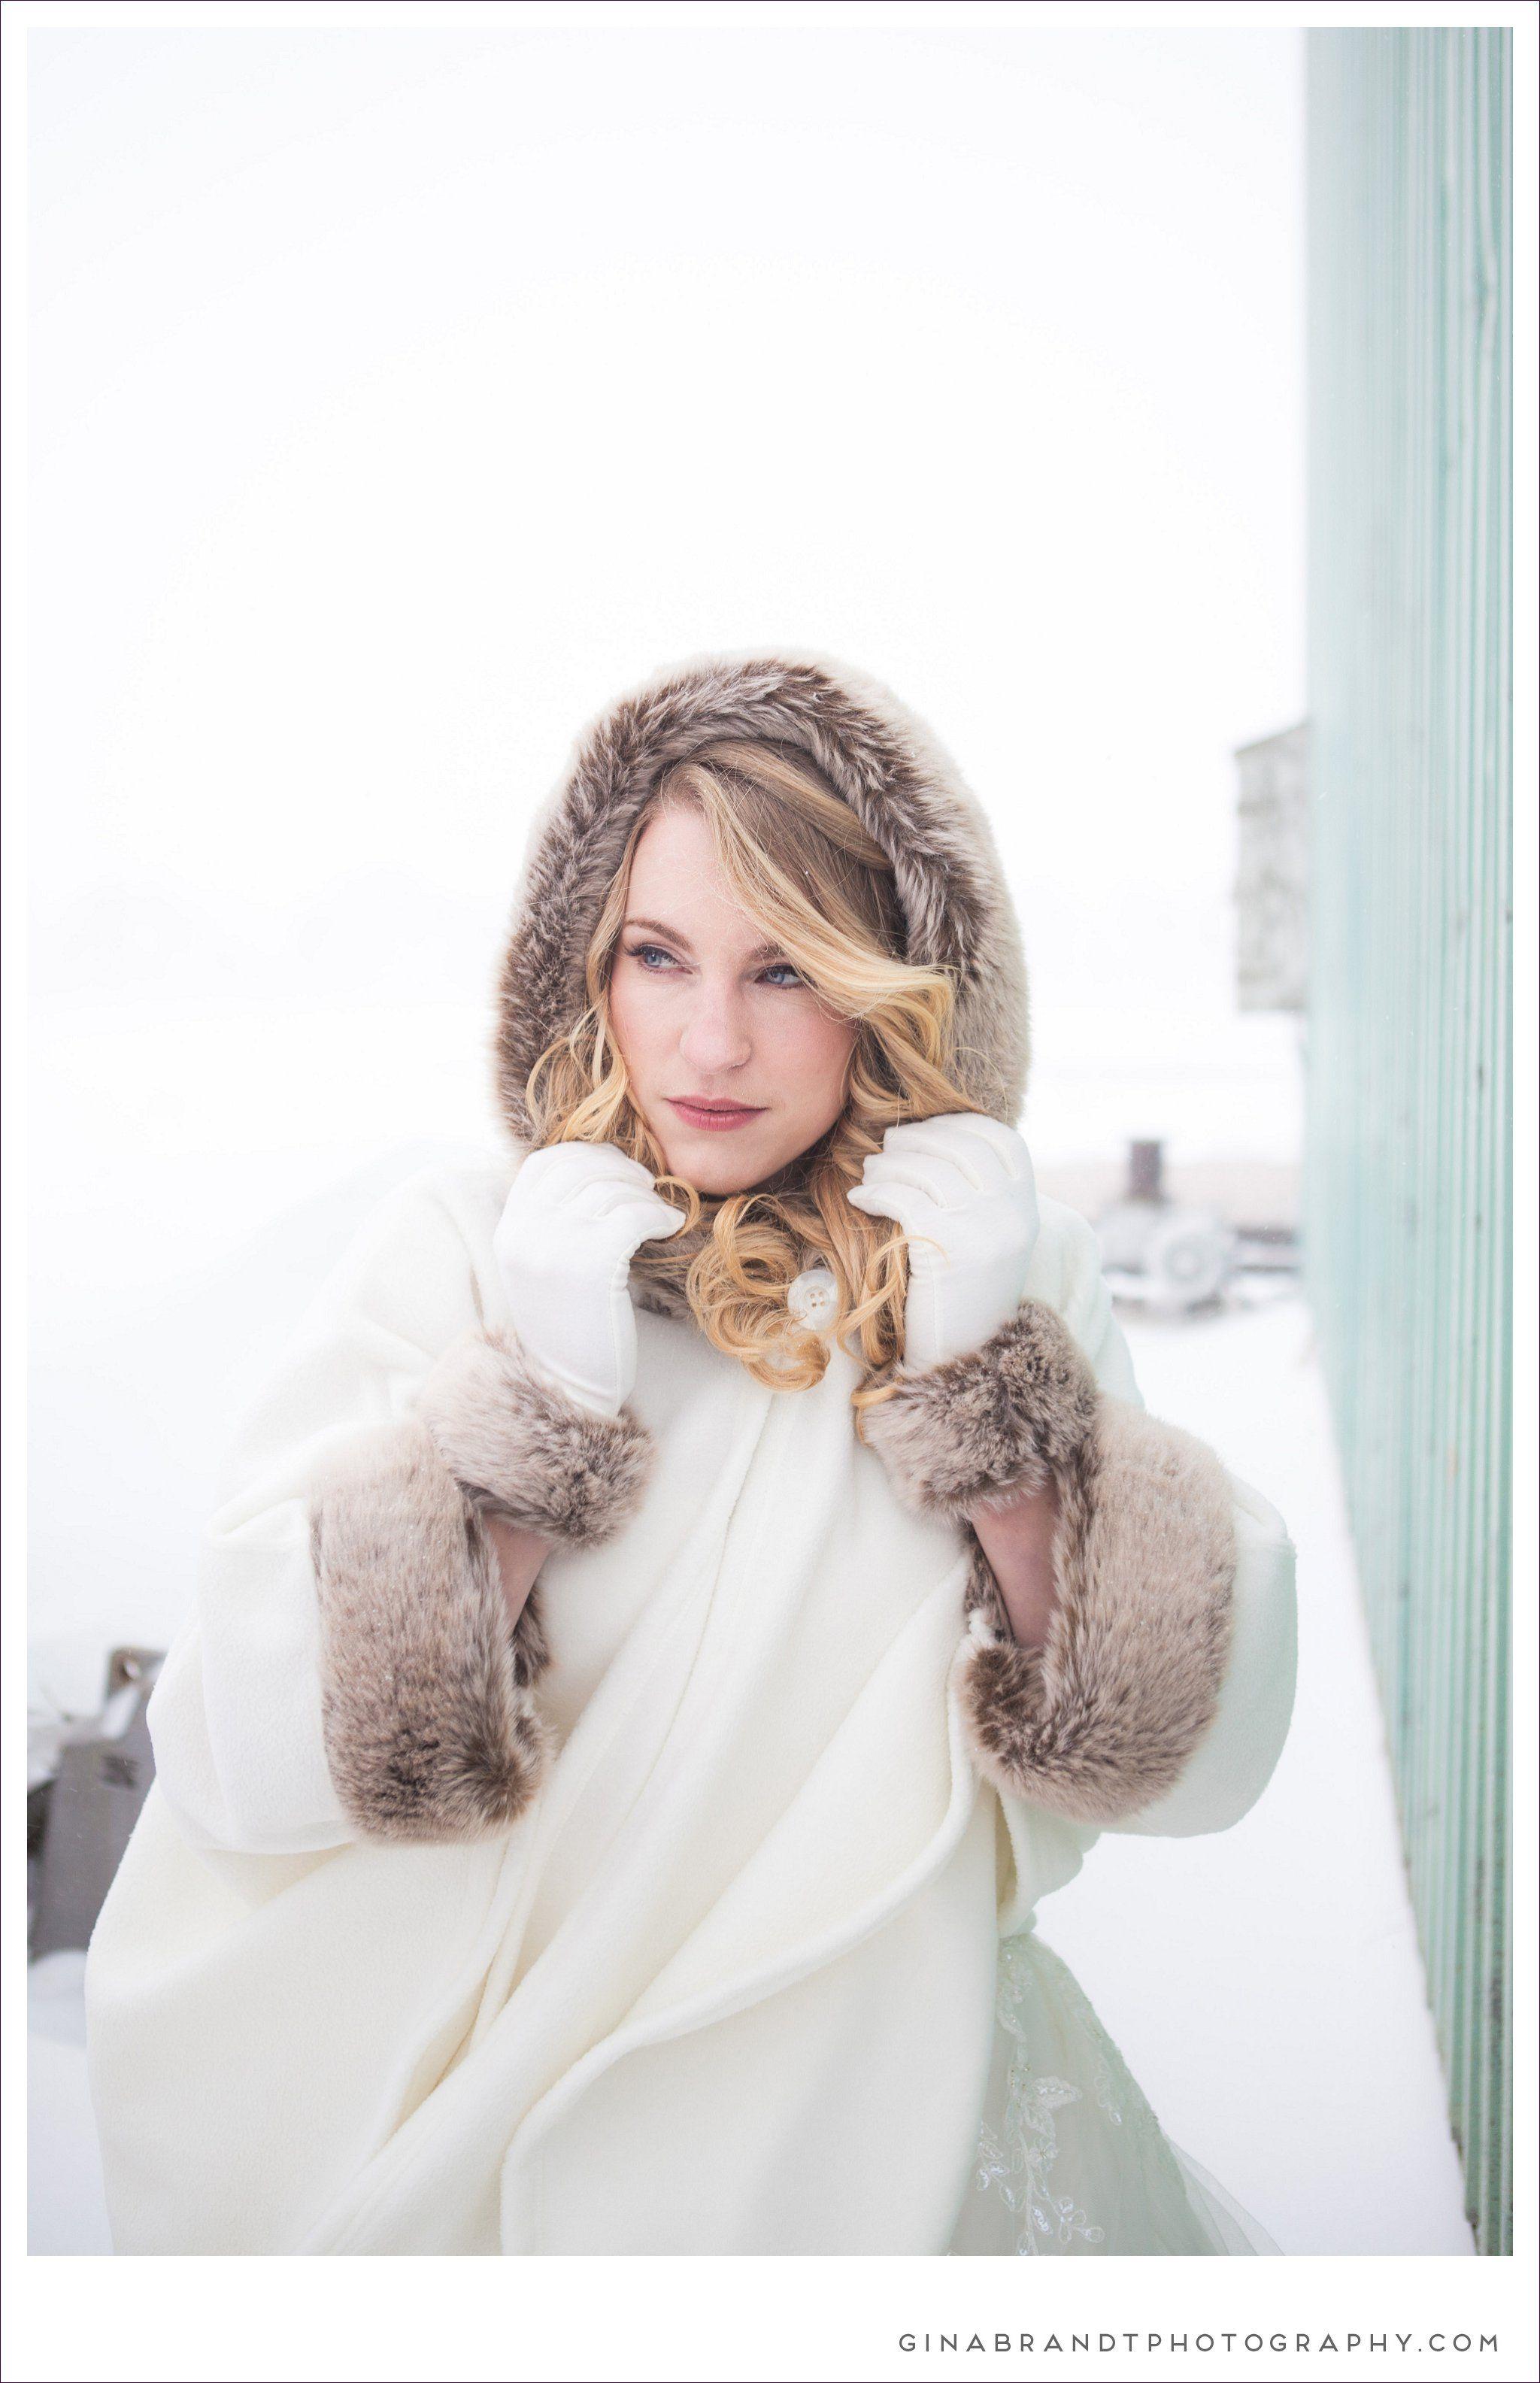 Preloved pronovias wedding dresses  Winter Wedding Photography  fur trimmed knit cashmere hooded poncho